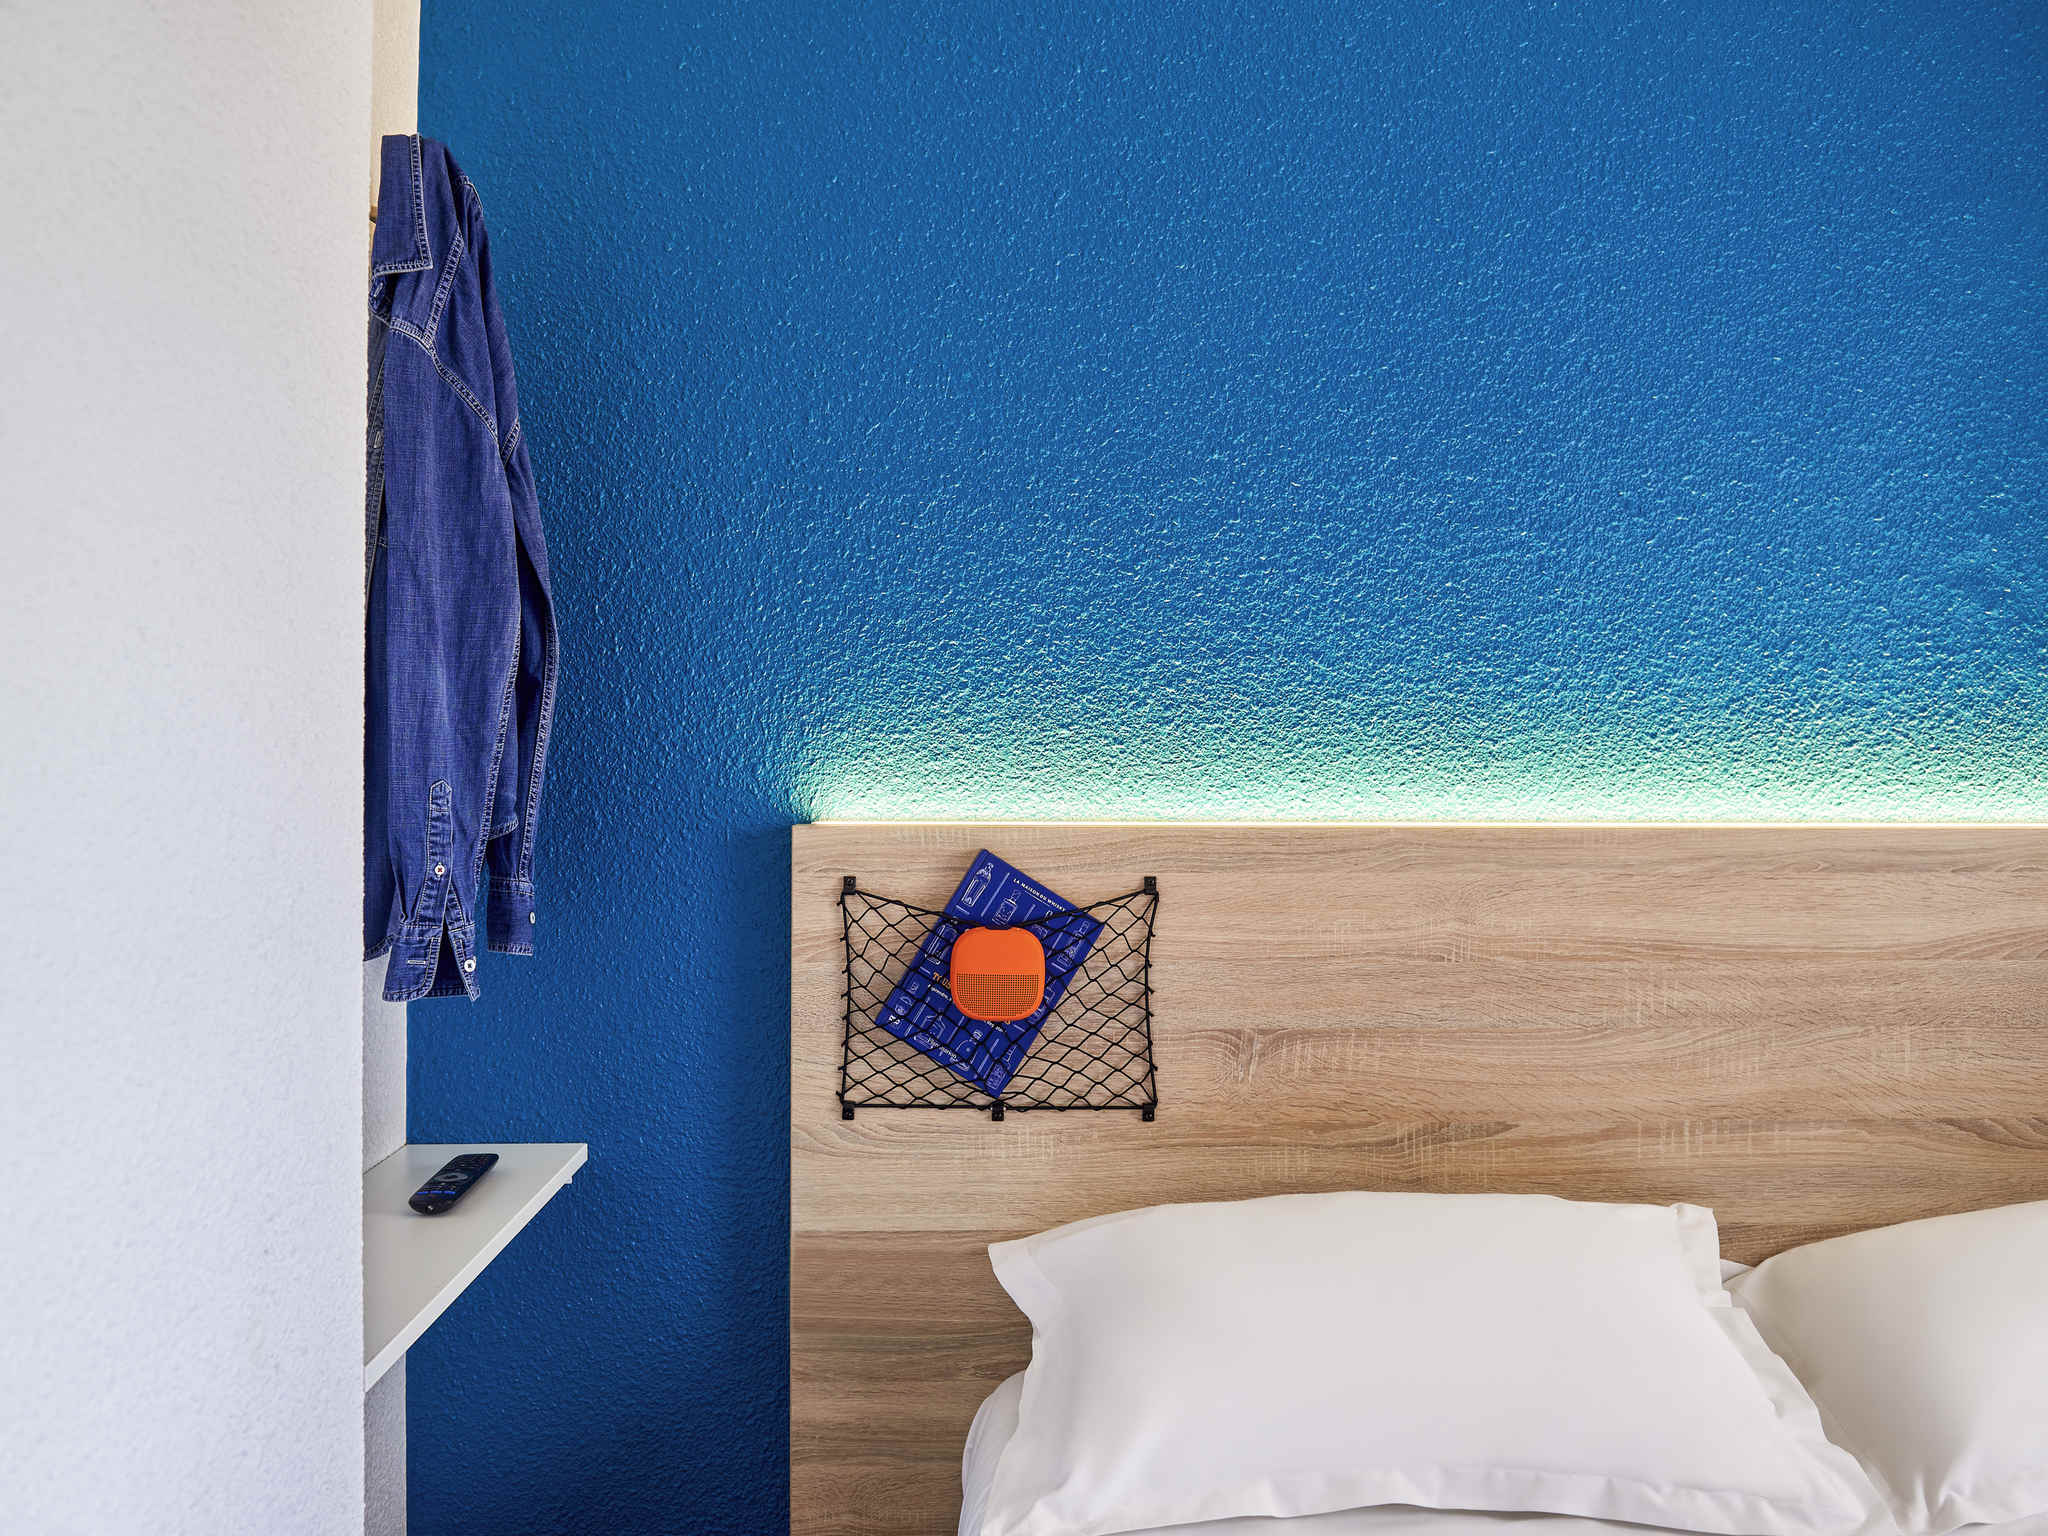 فندق - hotelF1 Chaumont